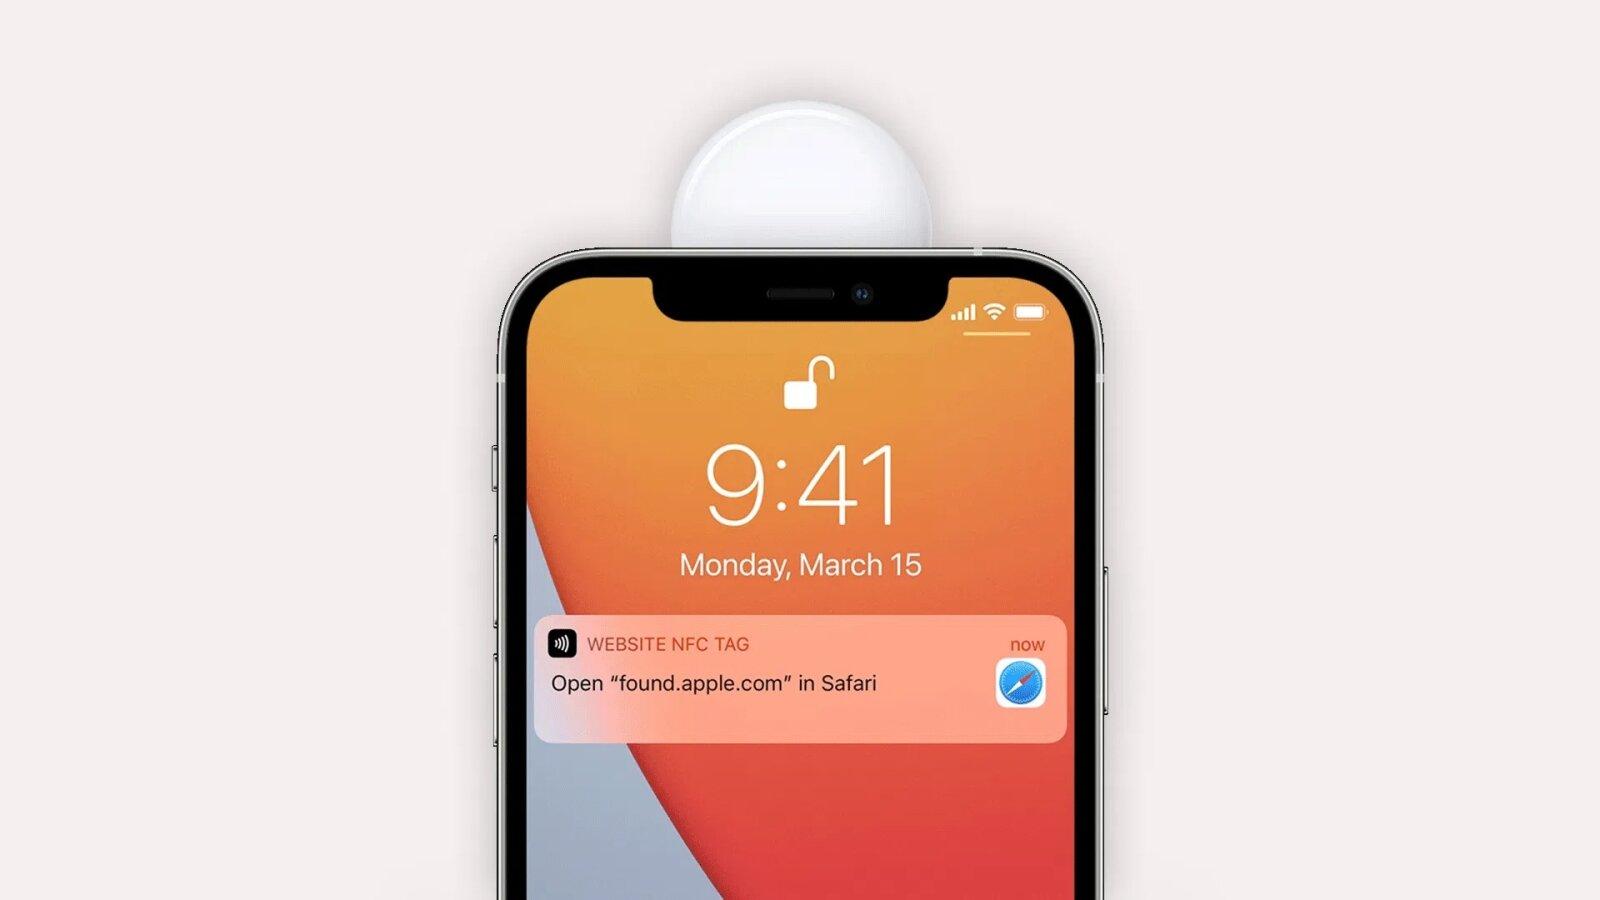 Lire AirTag avec NFC